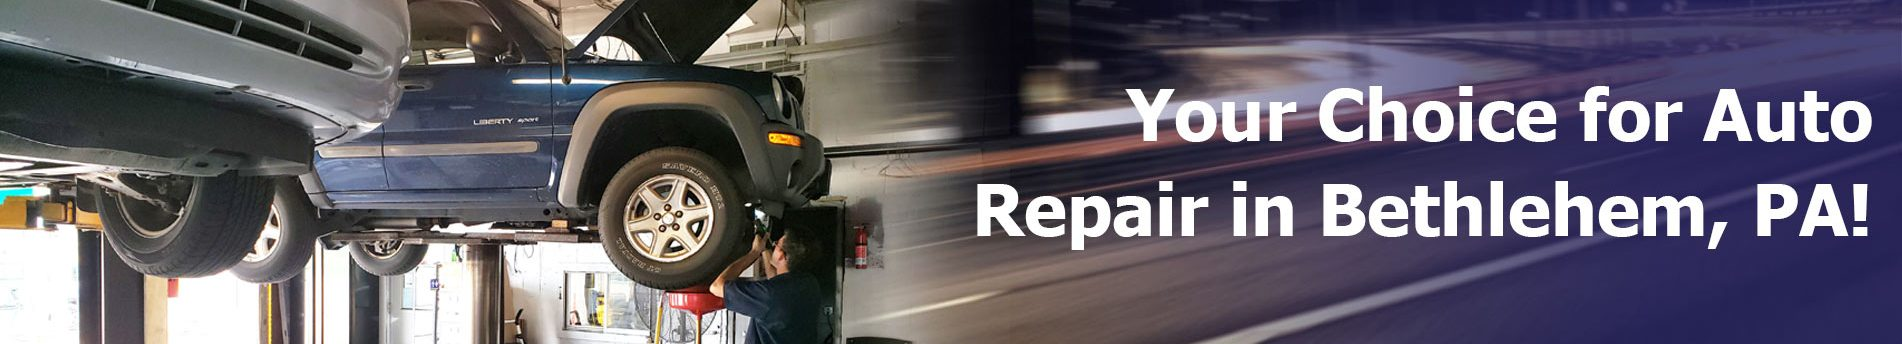 auto repair in bethlehem pa